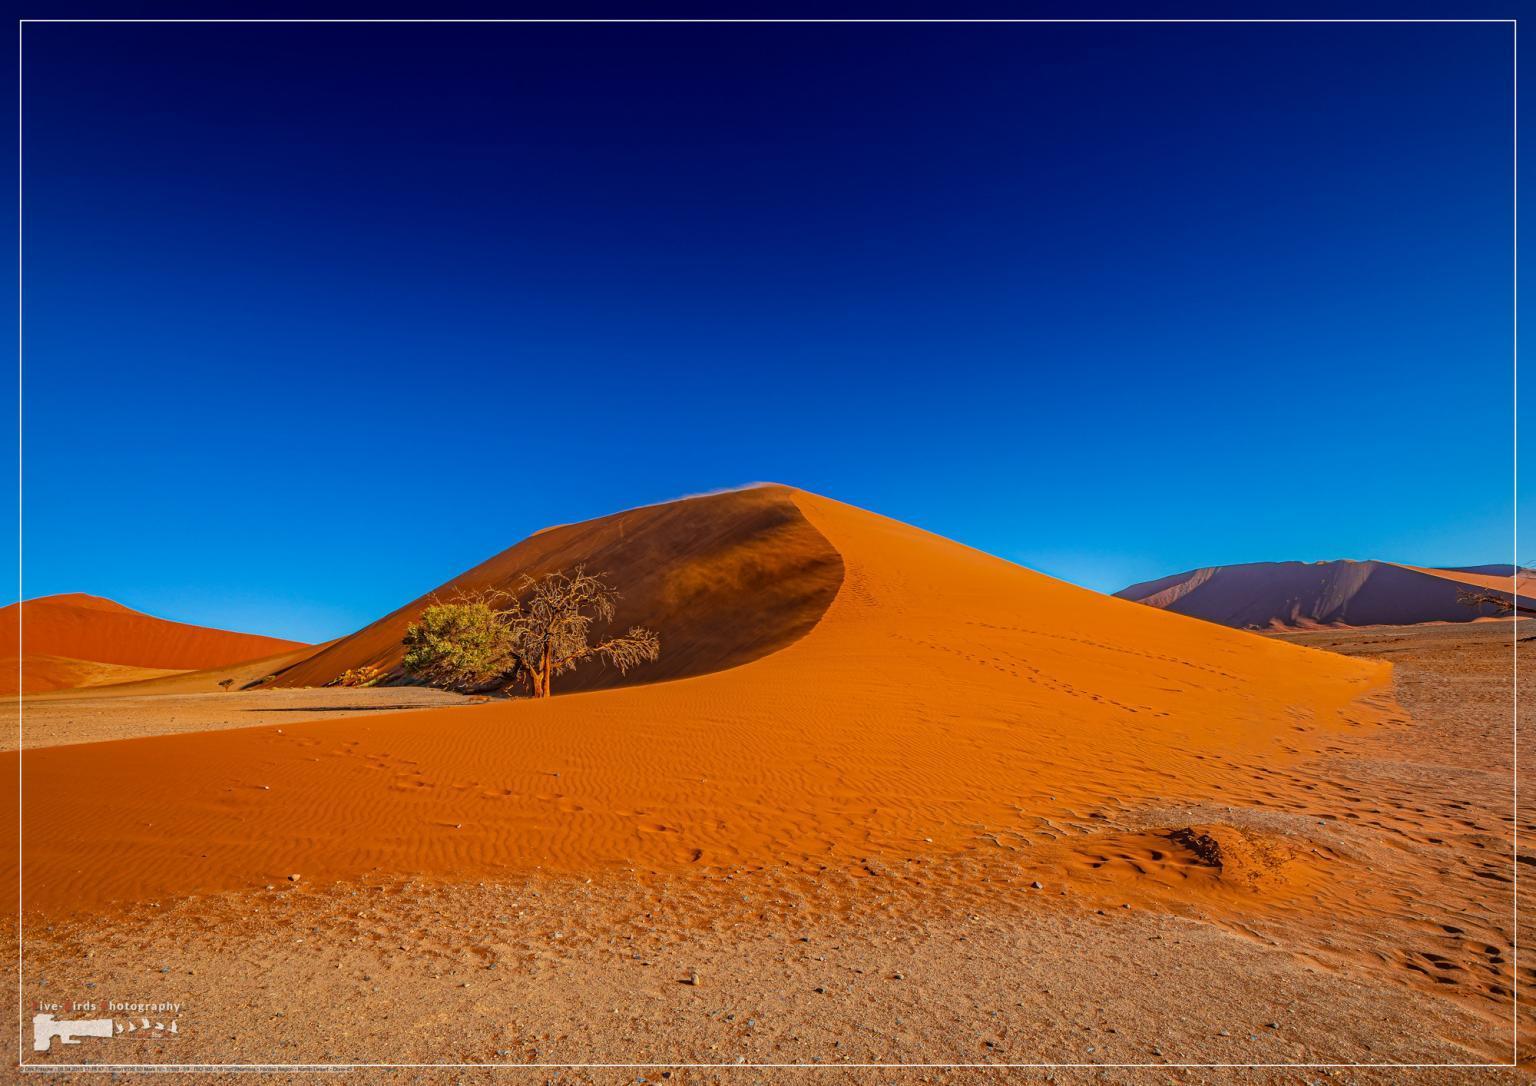 The world famous dune 45 in the Sossusvlei of the Namib Desert in Namibia